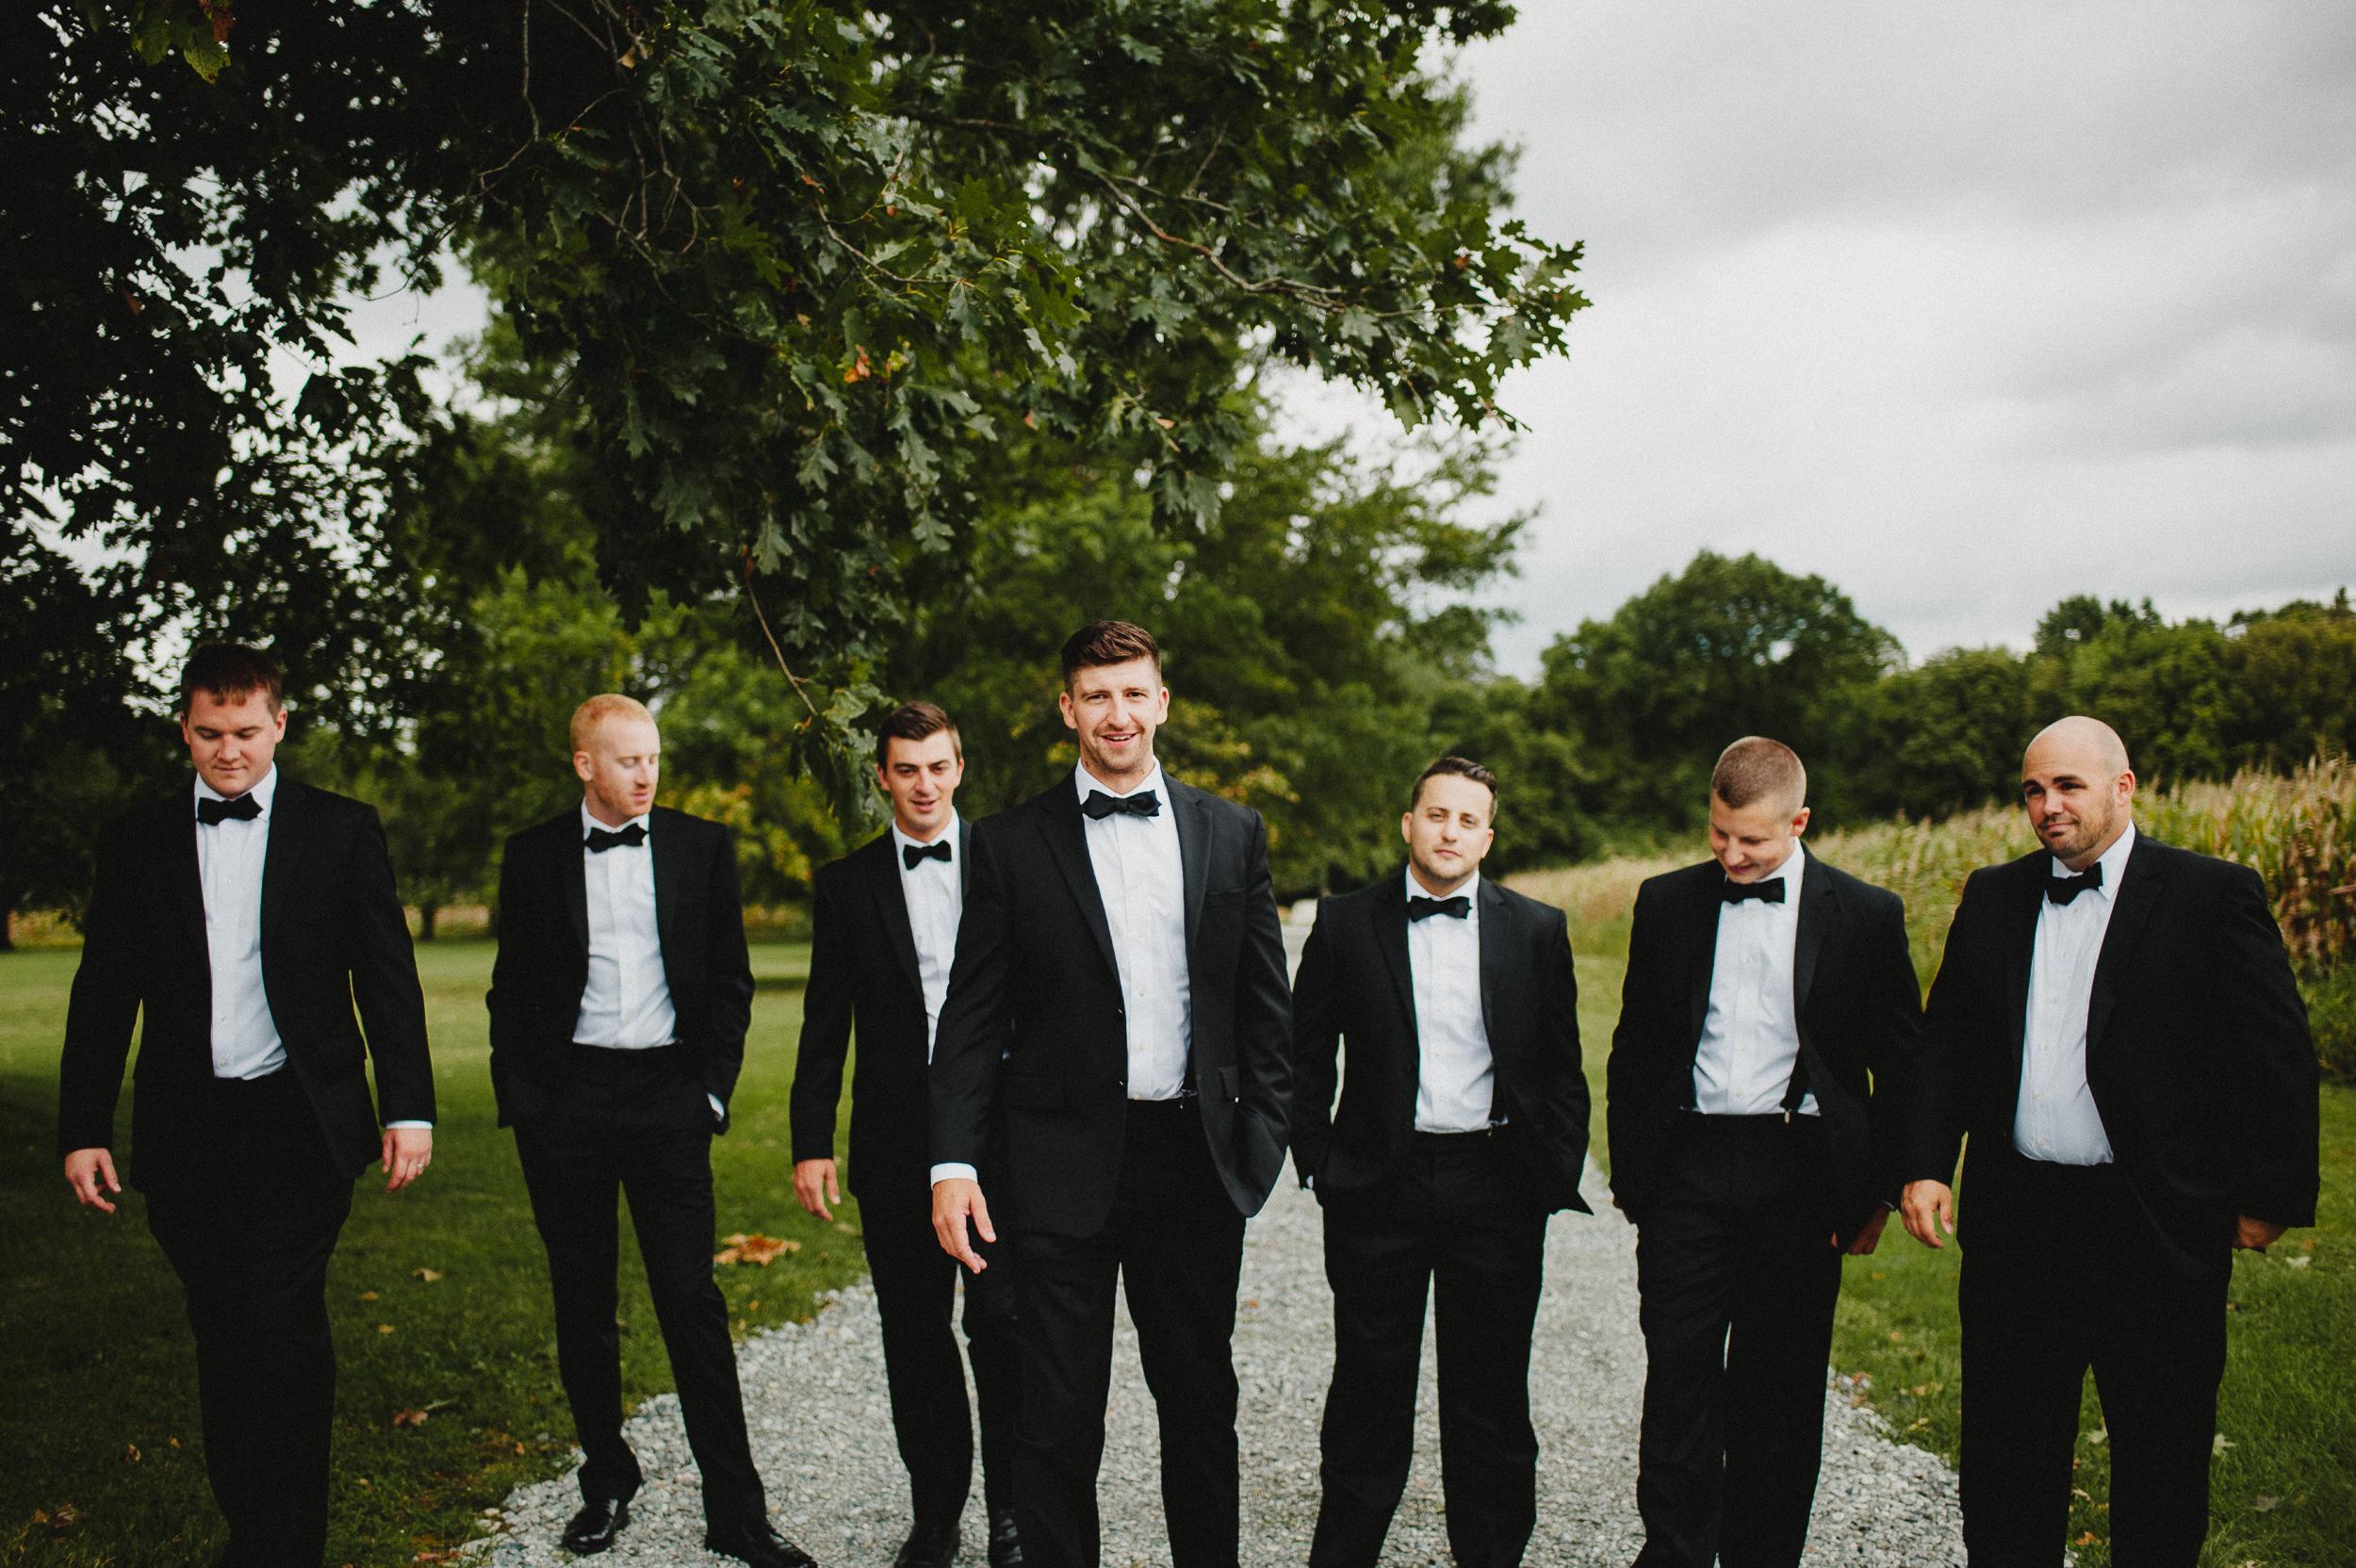 delaware-estate-wedding-photographer-pat-robinson-photography-50.jpg